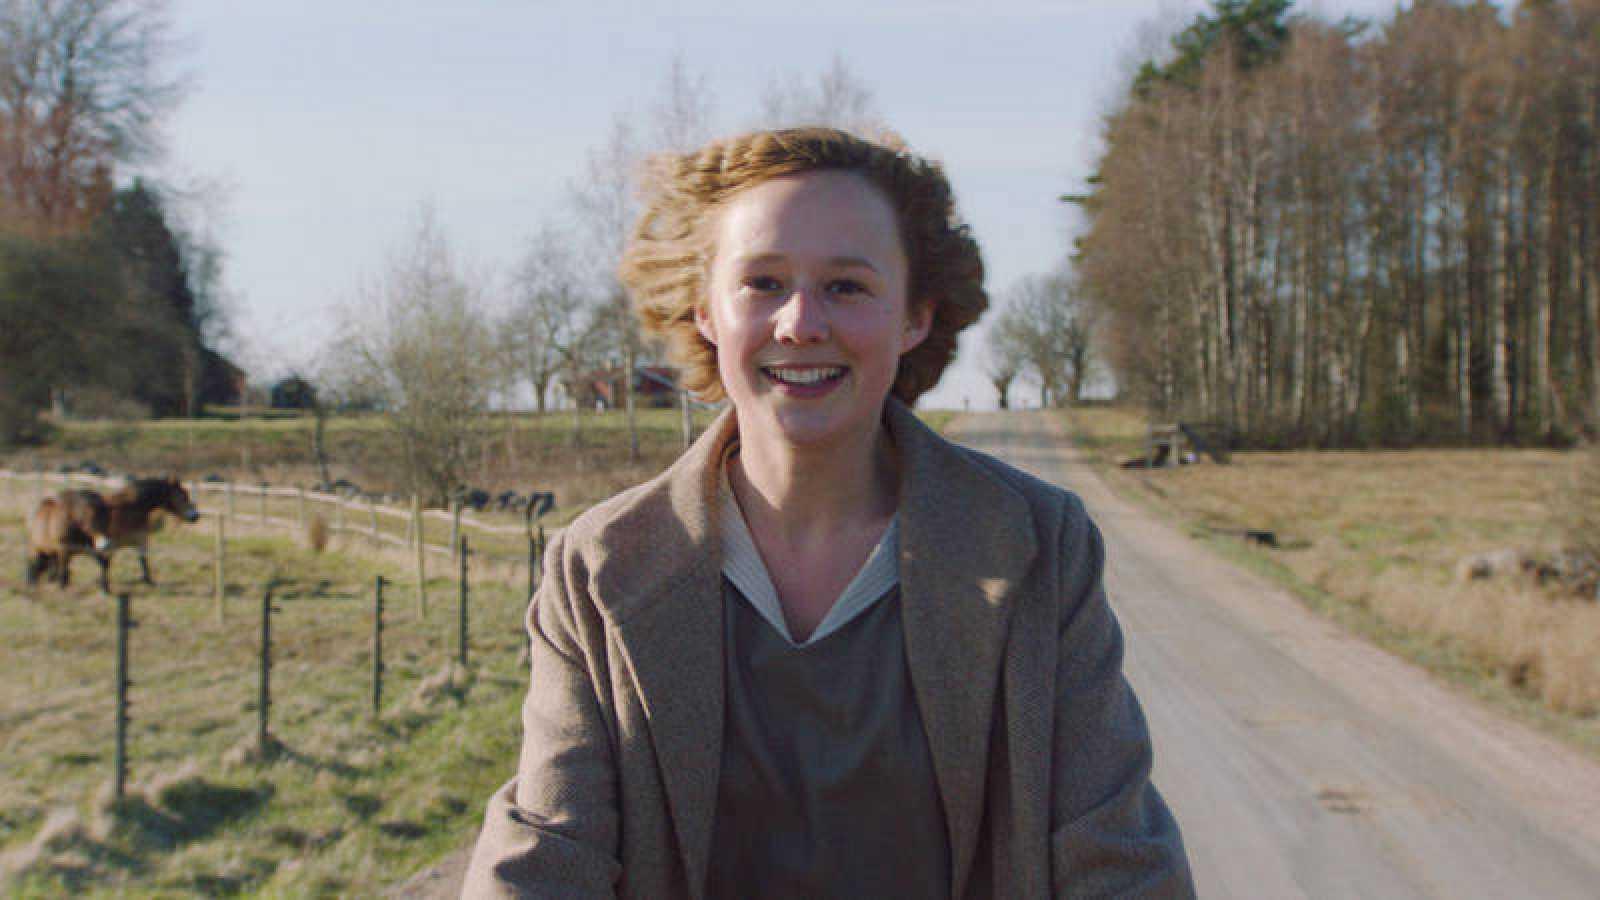 Resultado de imagen de Conociendo a Astrid de Pernille Fischer Christensen